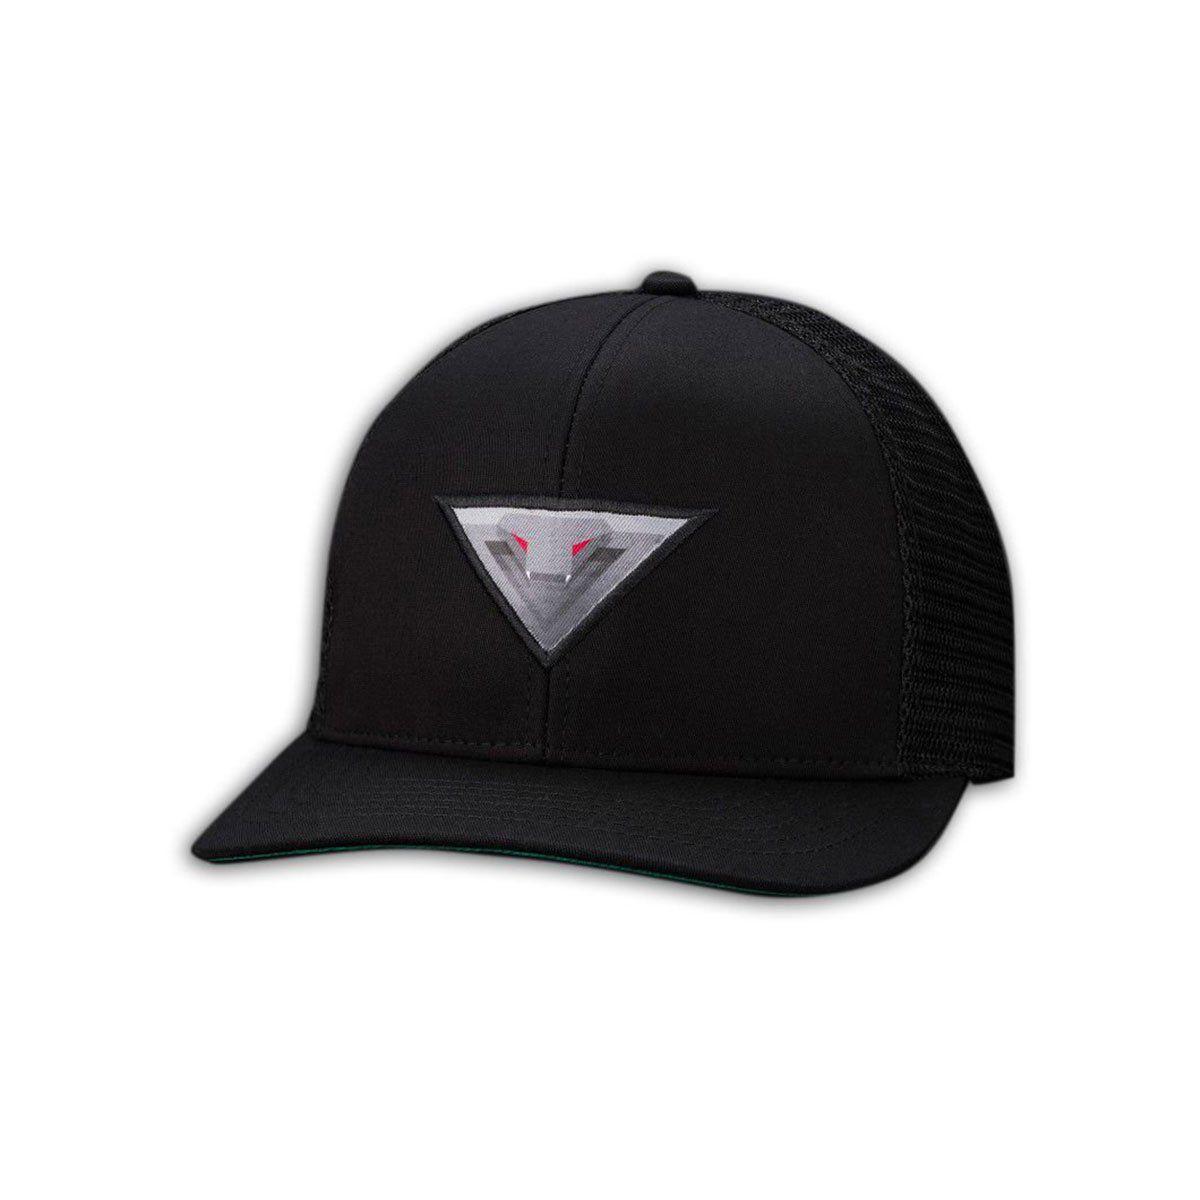 Boné Redai Brand Modelo Black Mamba